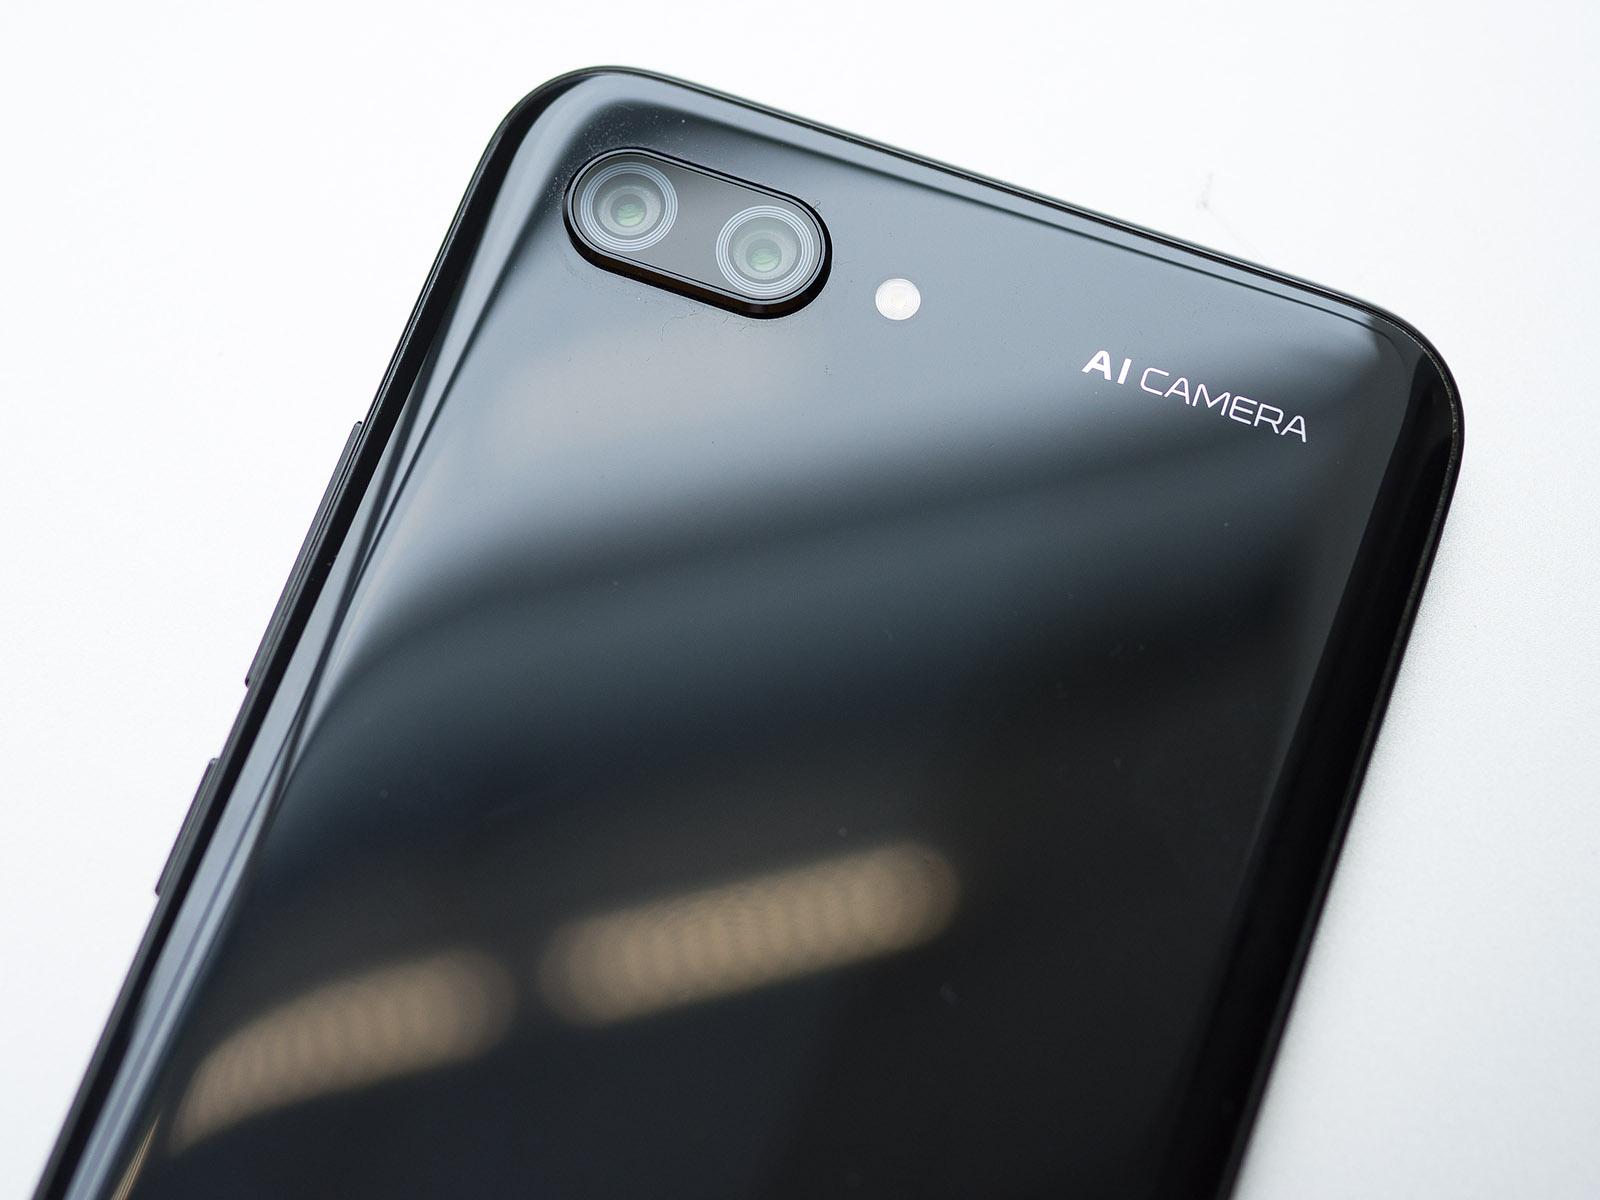 Как фотографирует новый Honor 10. Сравниваем с Huawei P20 и iPhone 7 Plus - 6